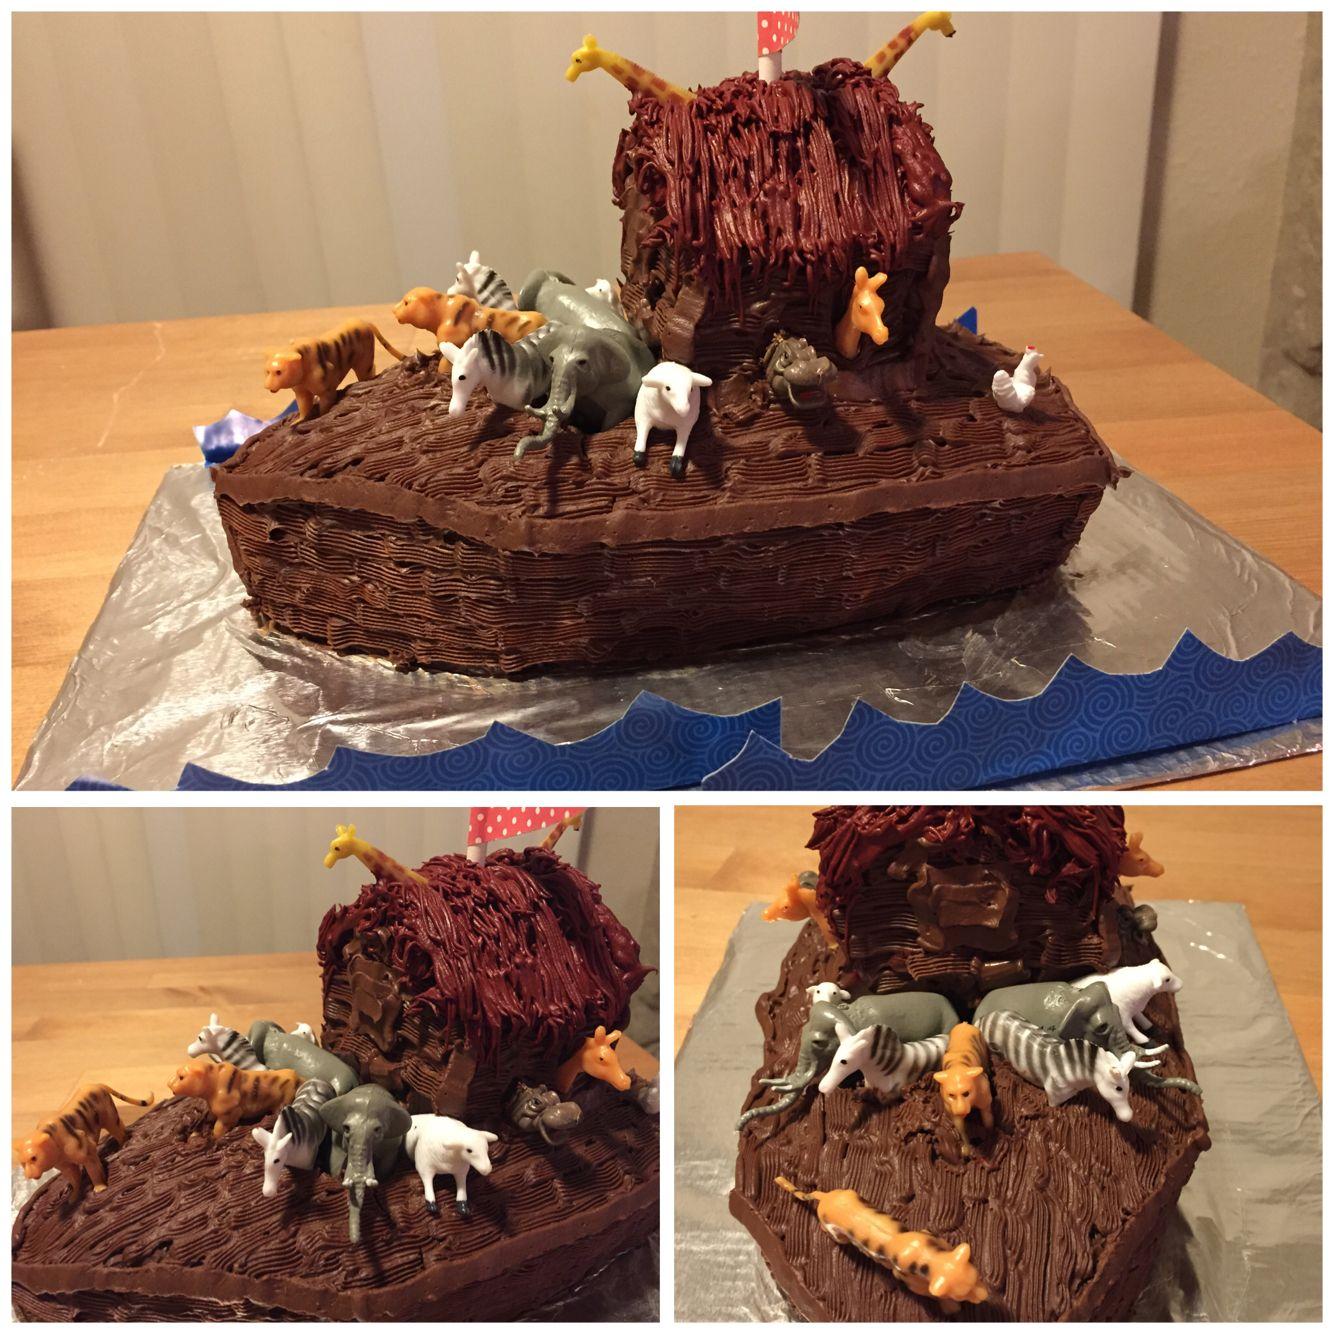 Noahs Ark Smash Cake Eggfree dairyfree coconut base icing